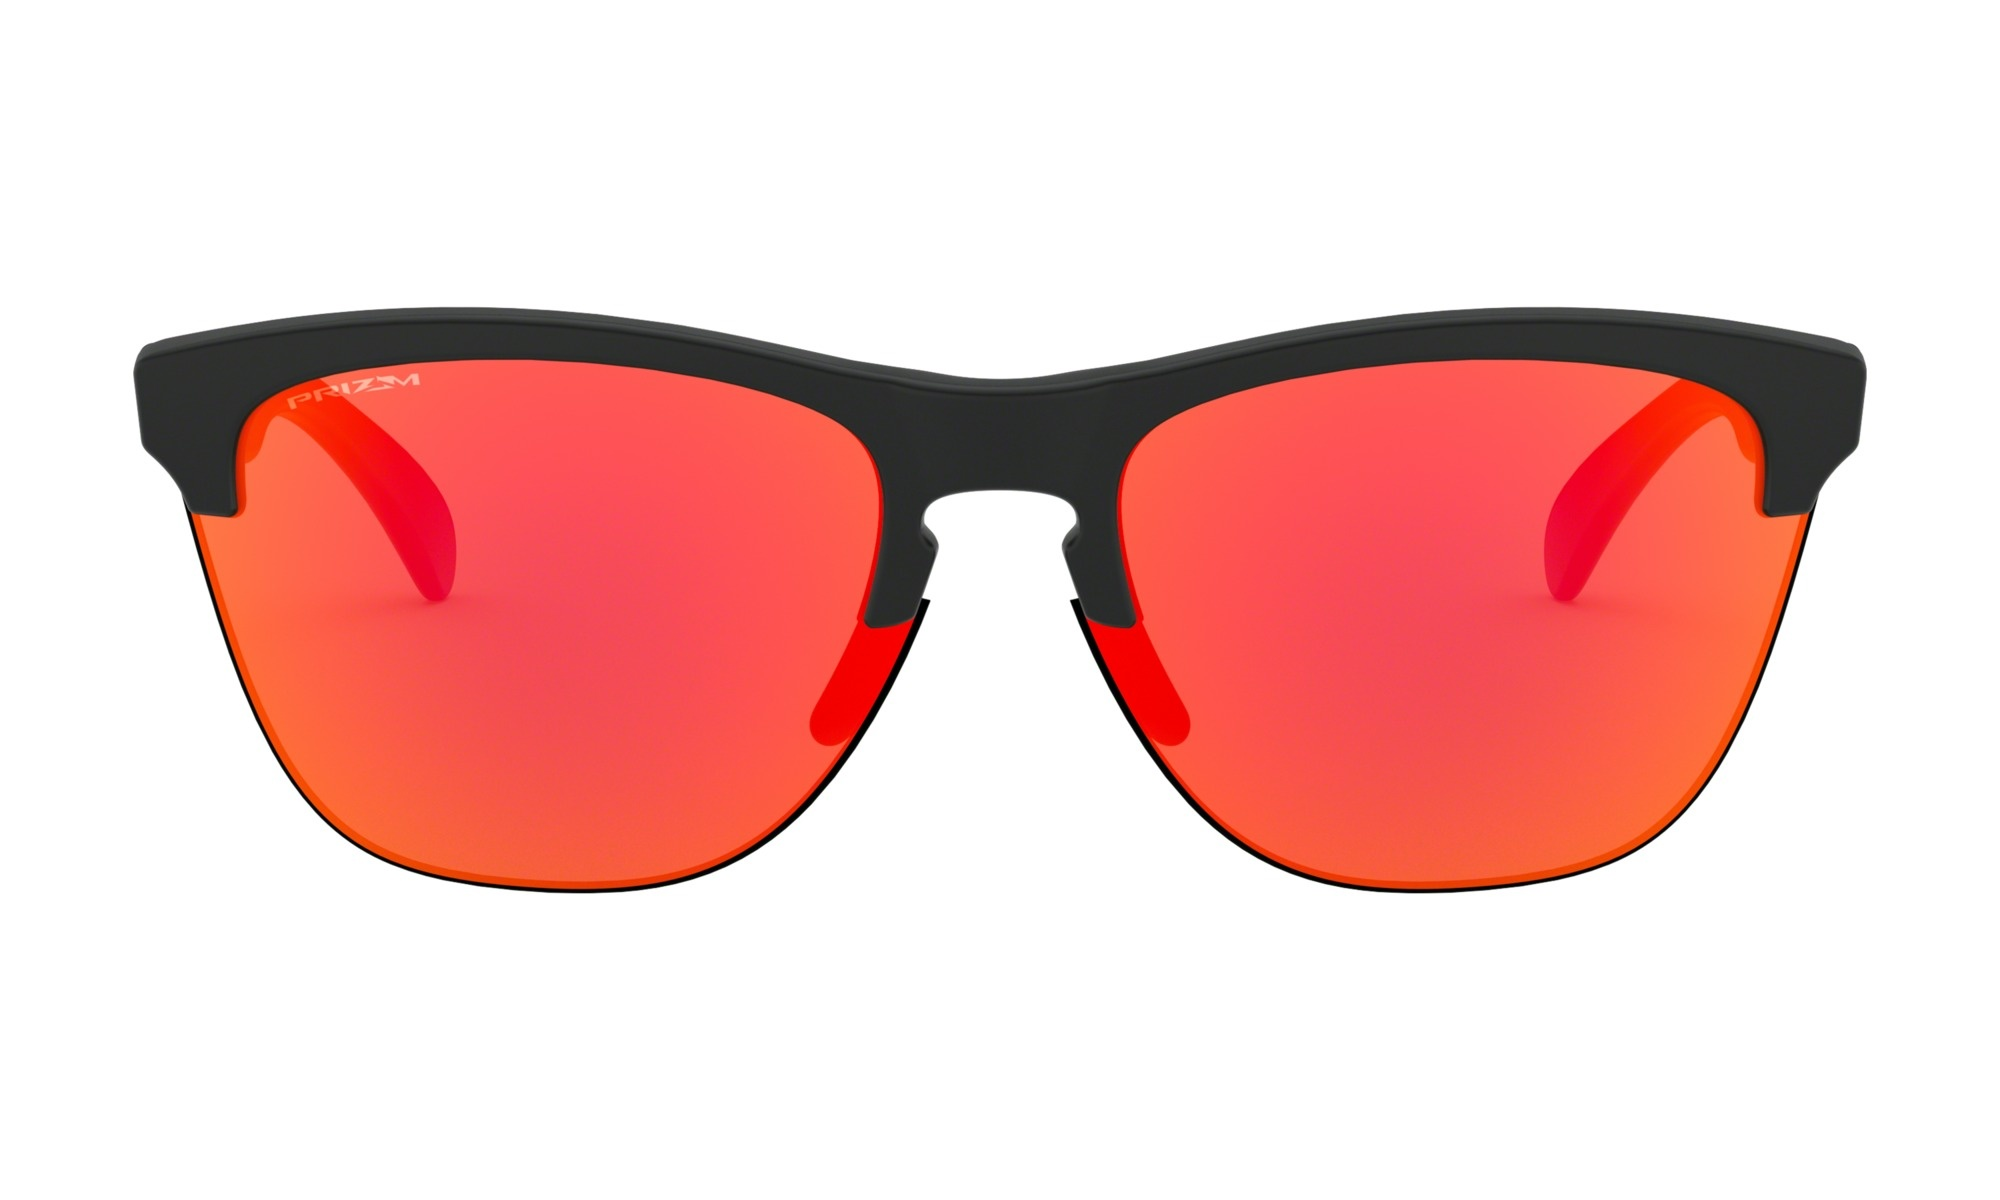 84d008e5205e5 Oakley Frogskins Lite Sunglasses - Matte Black Prizm Ruby - MODA3